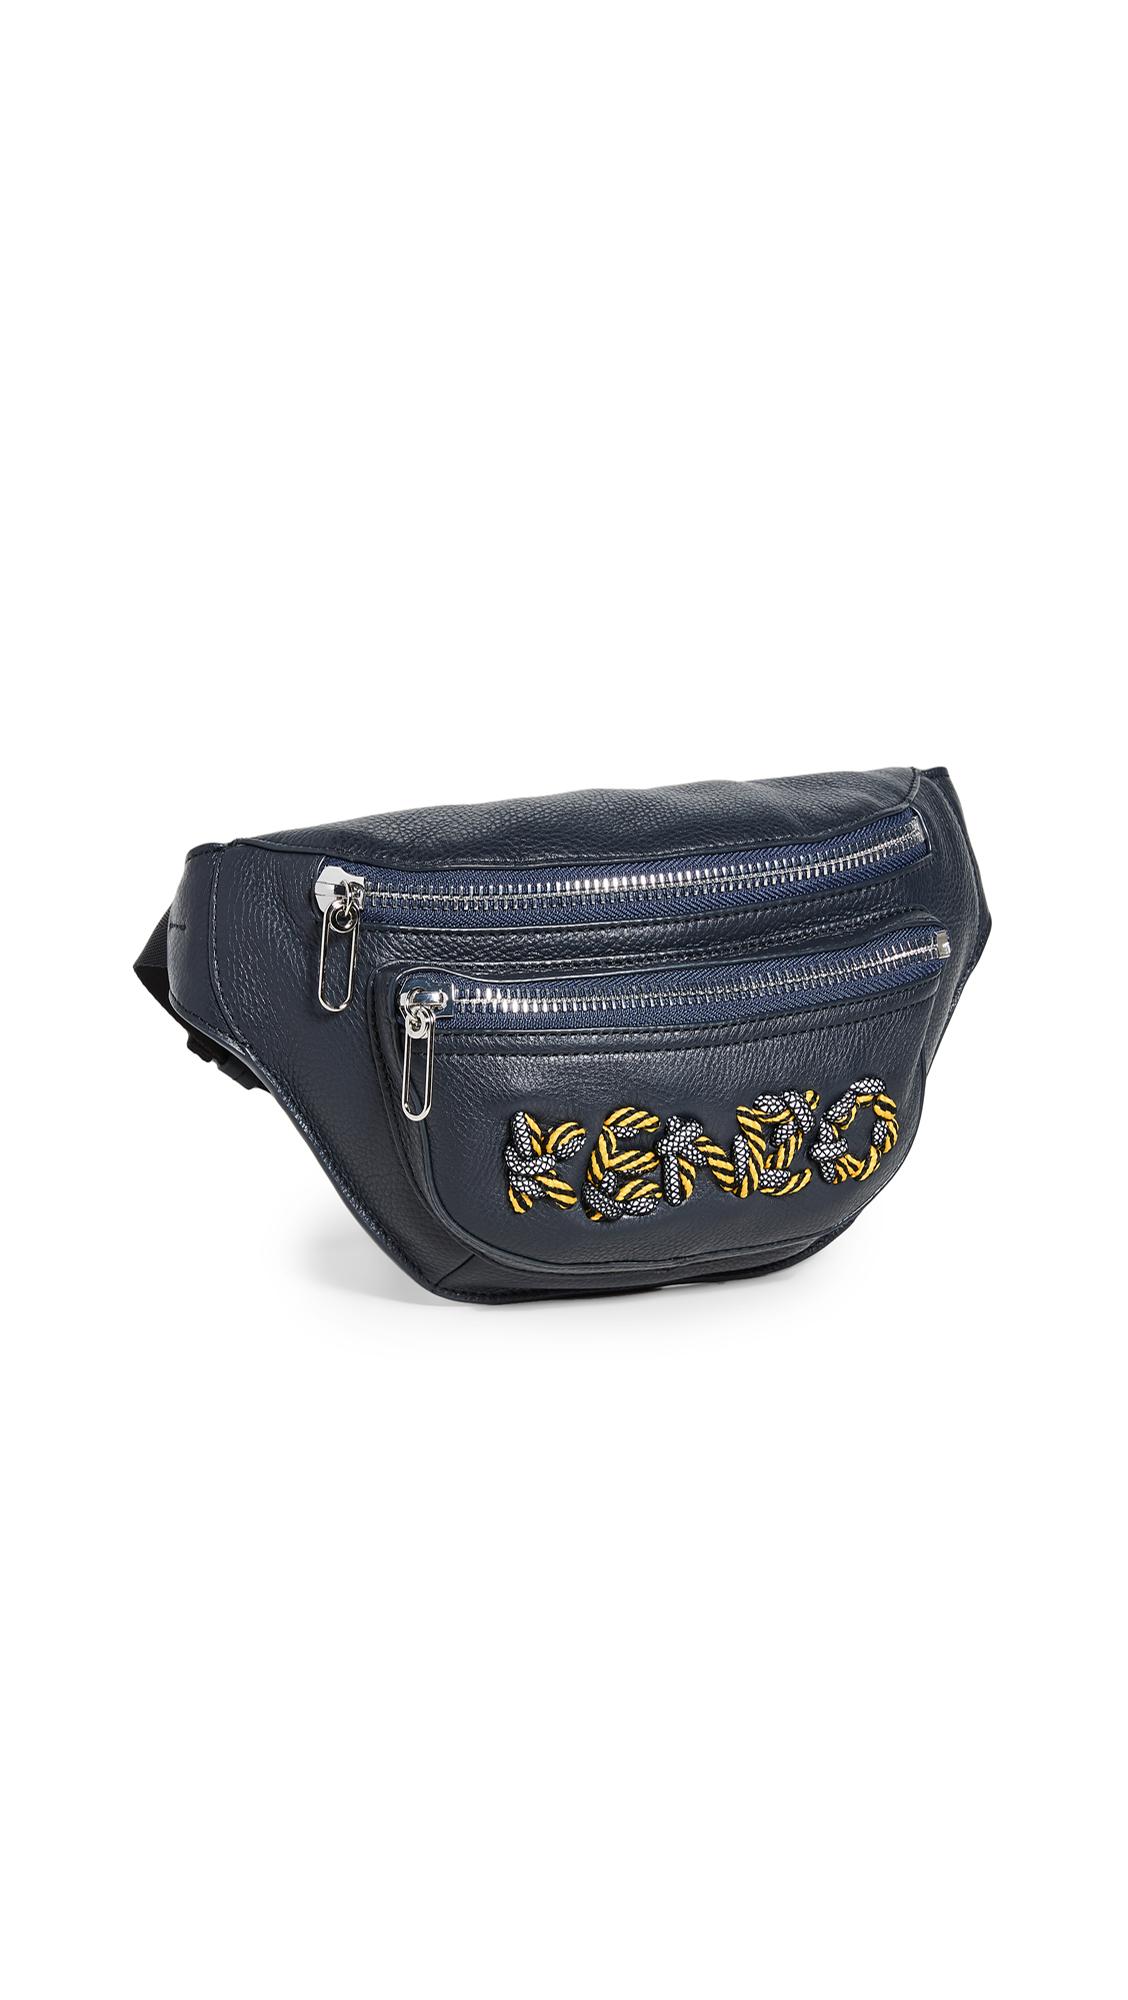 KENZO Kontrast Bum Bag - Navy Blue